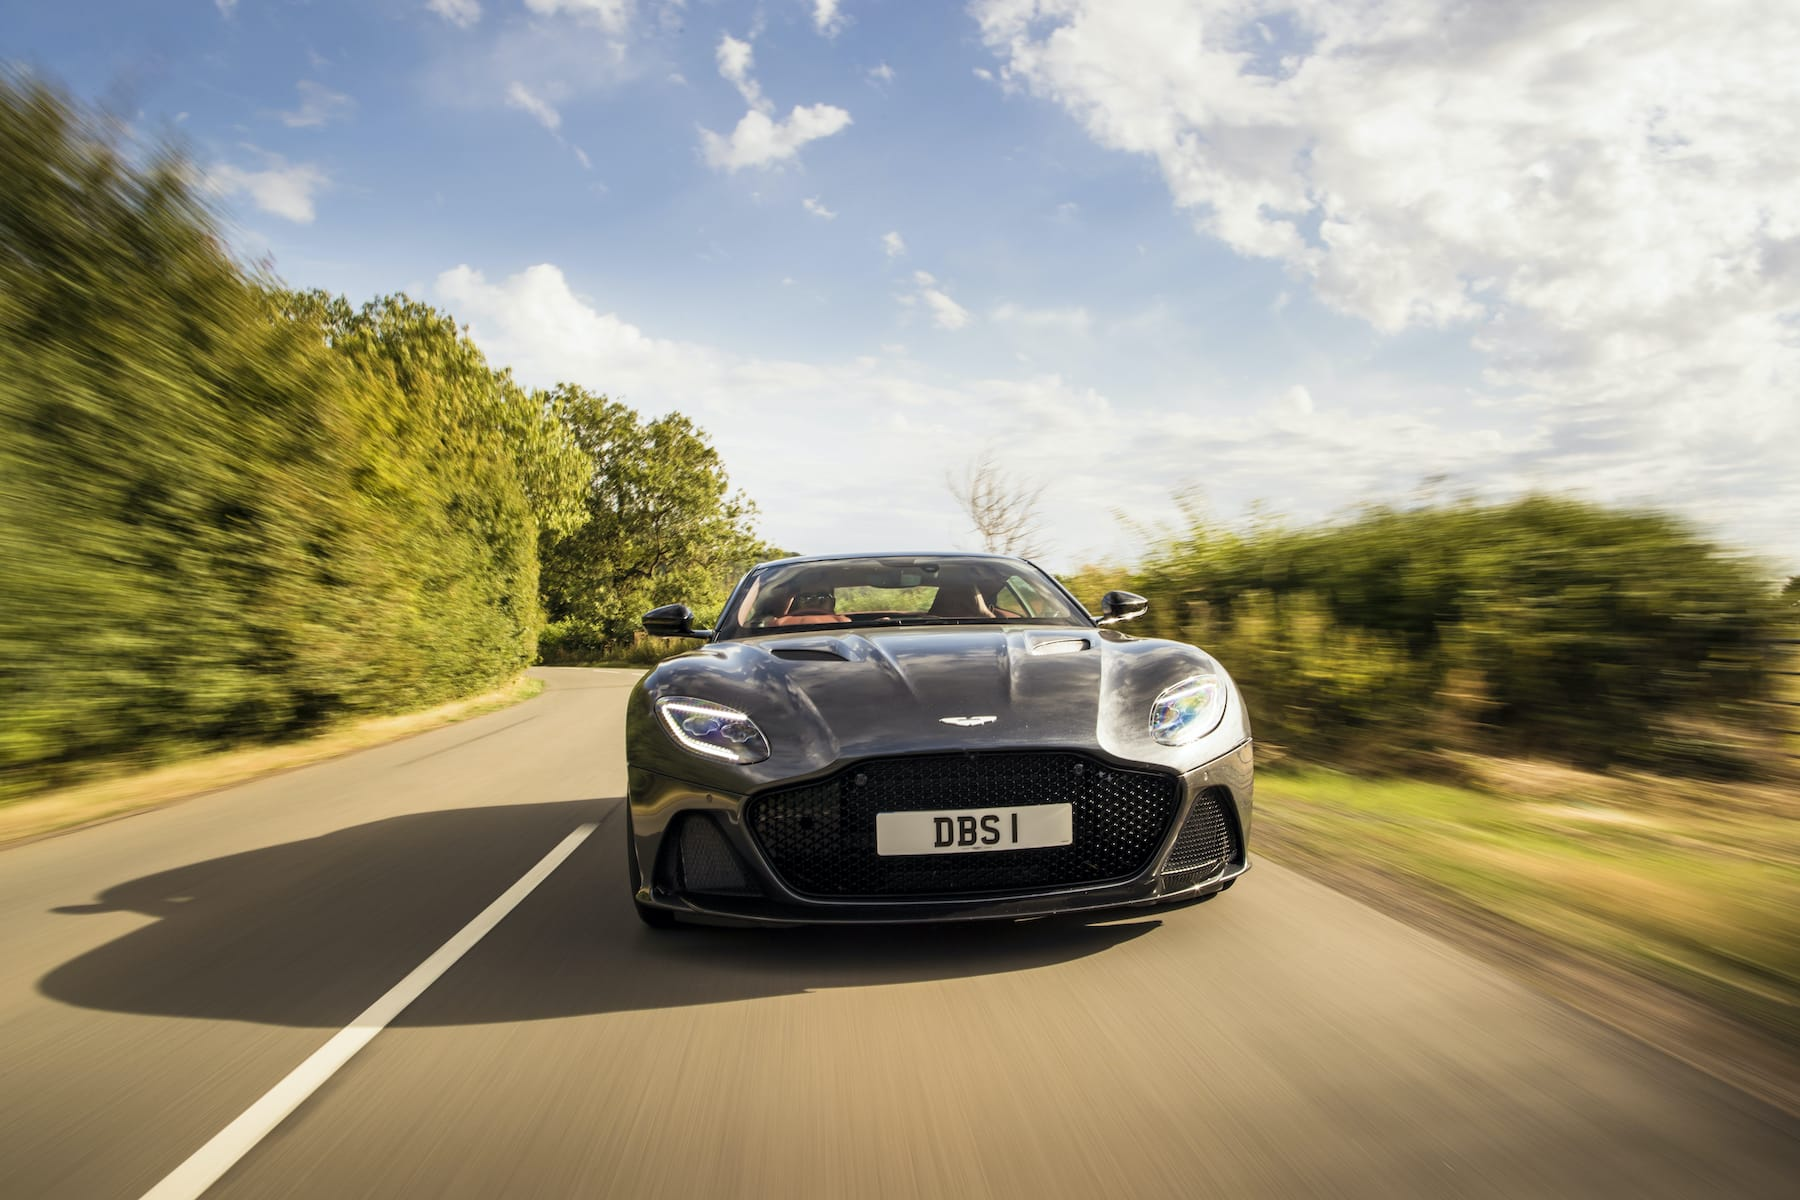 Aston Martin DBS (2018 onwards) – front view